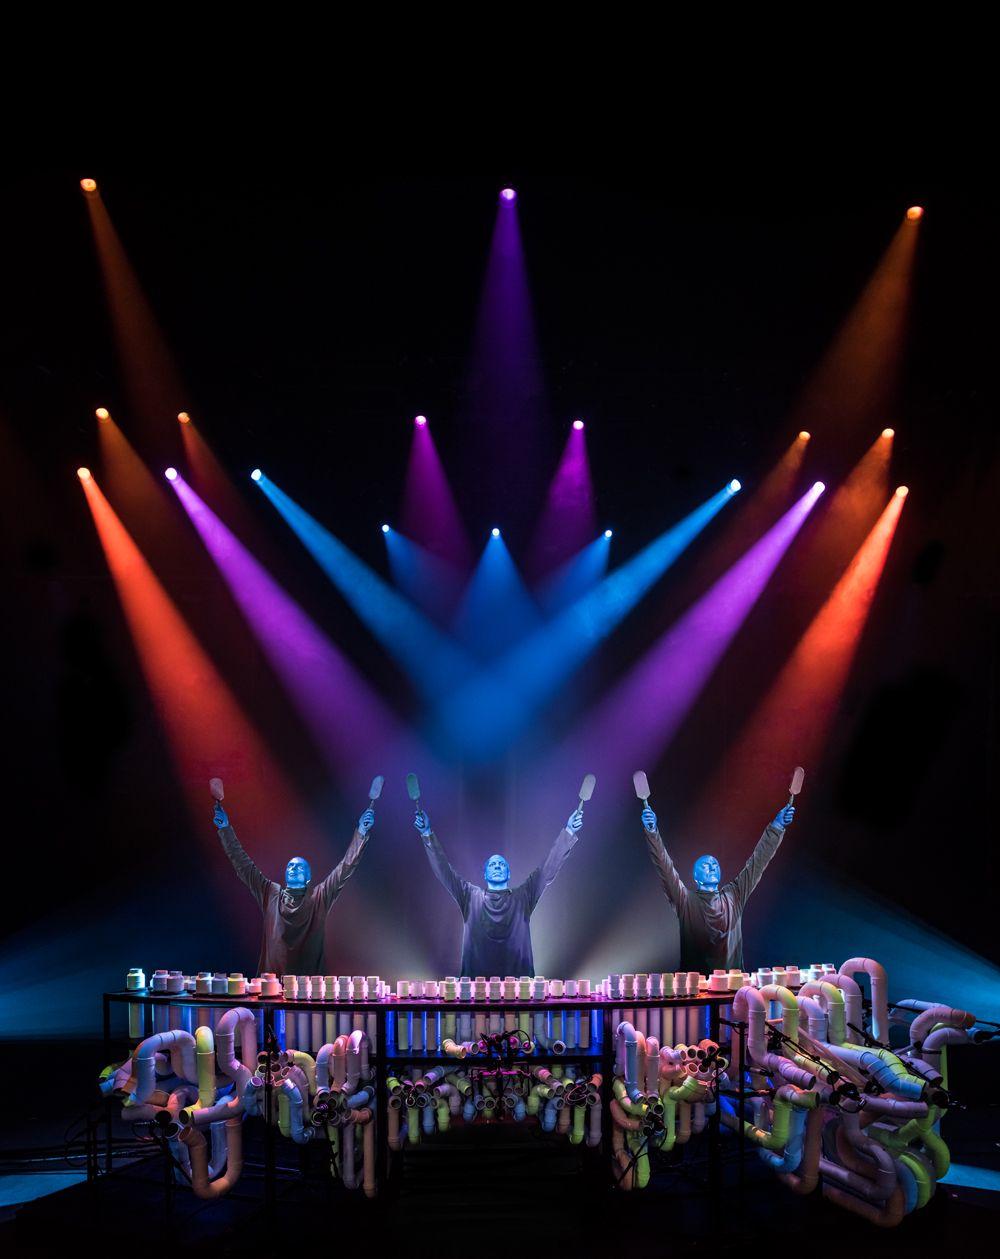 Шоу Blue Man Group фото 4